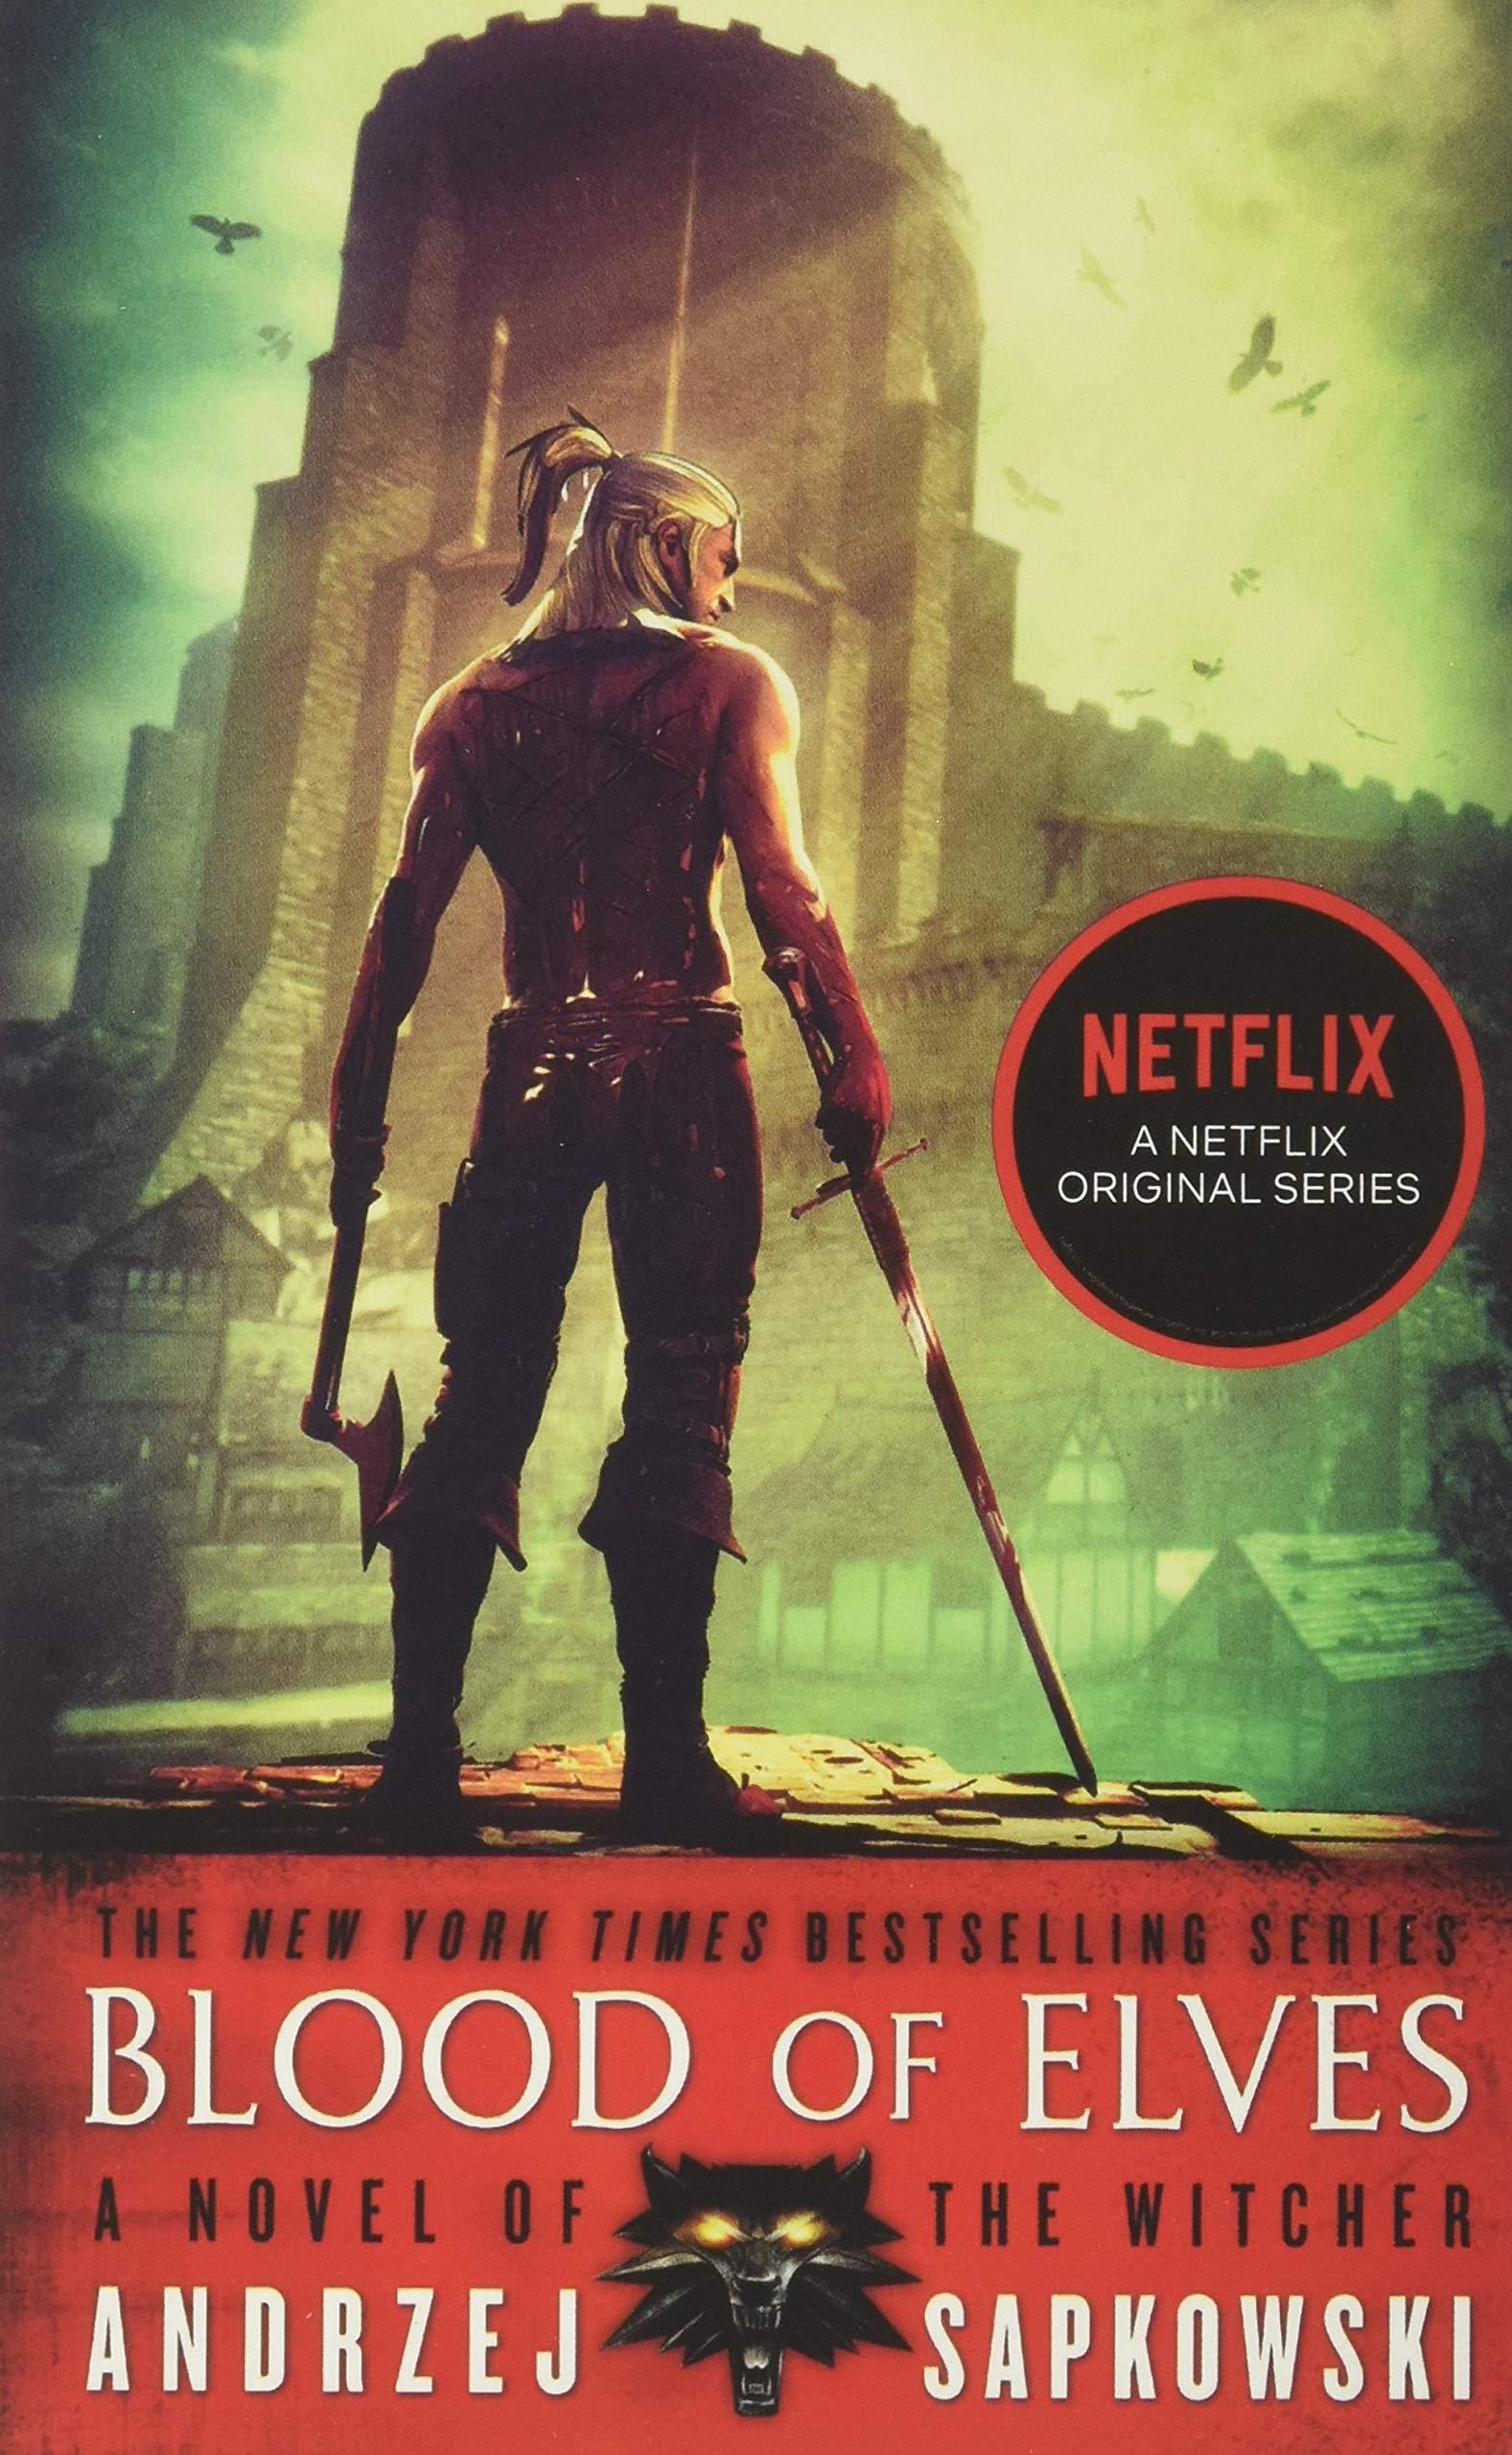 Amazon.com: Blood of Elves: 9780316029193: Sapkowski, Andrzej: Books